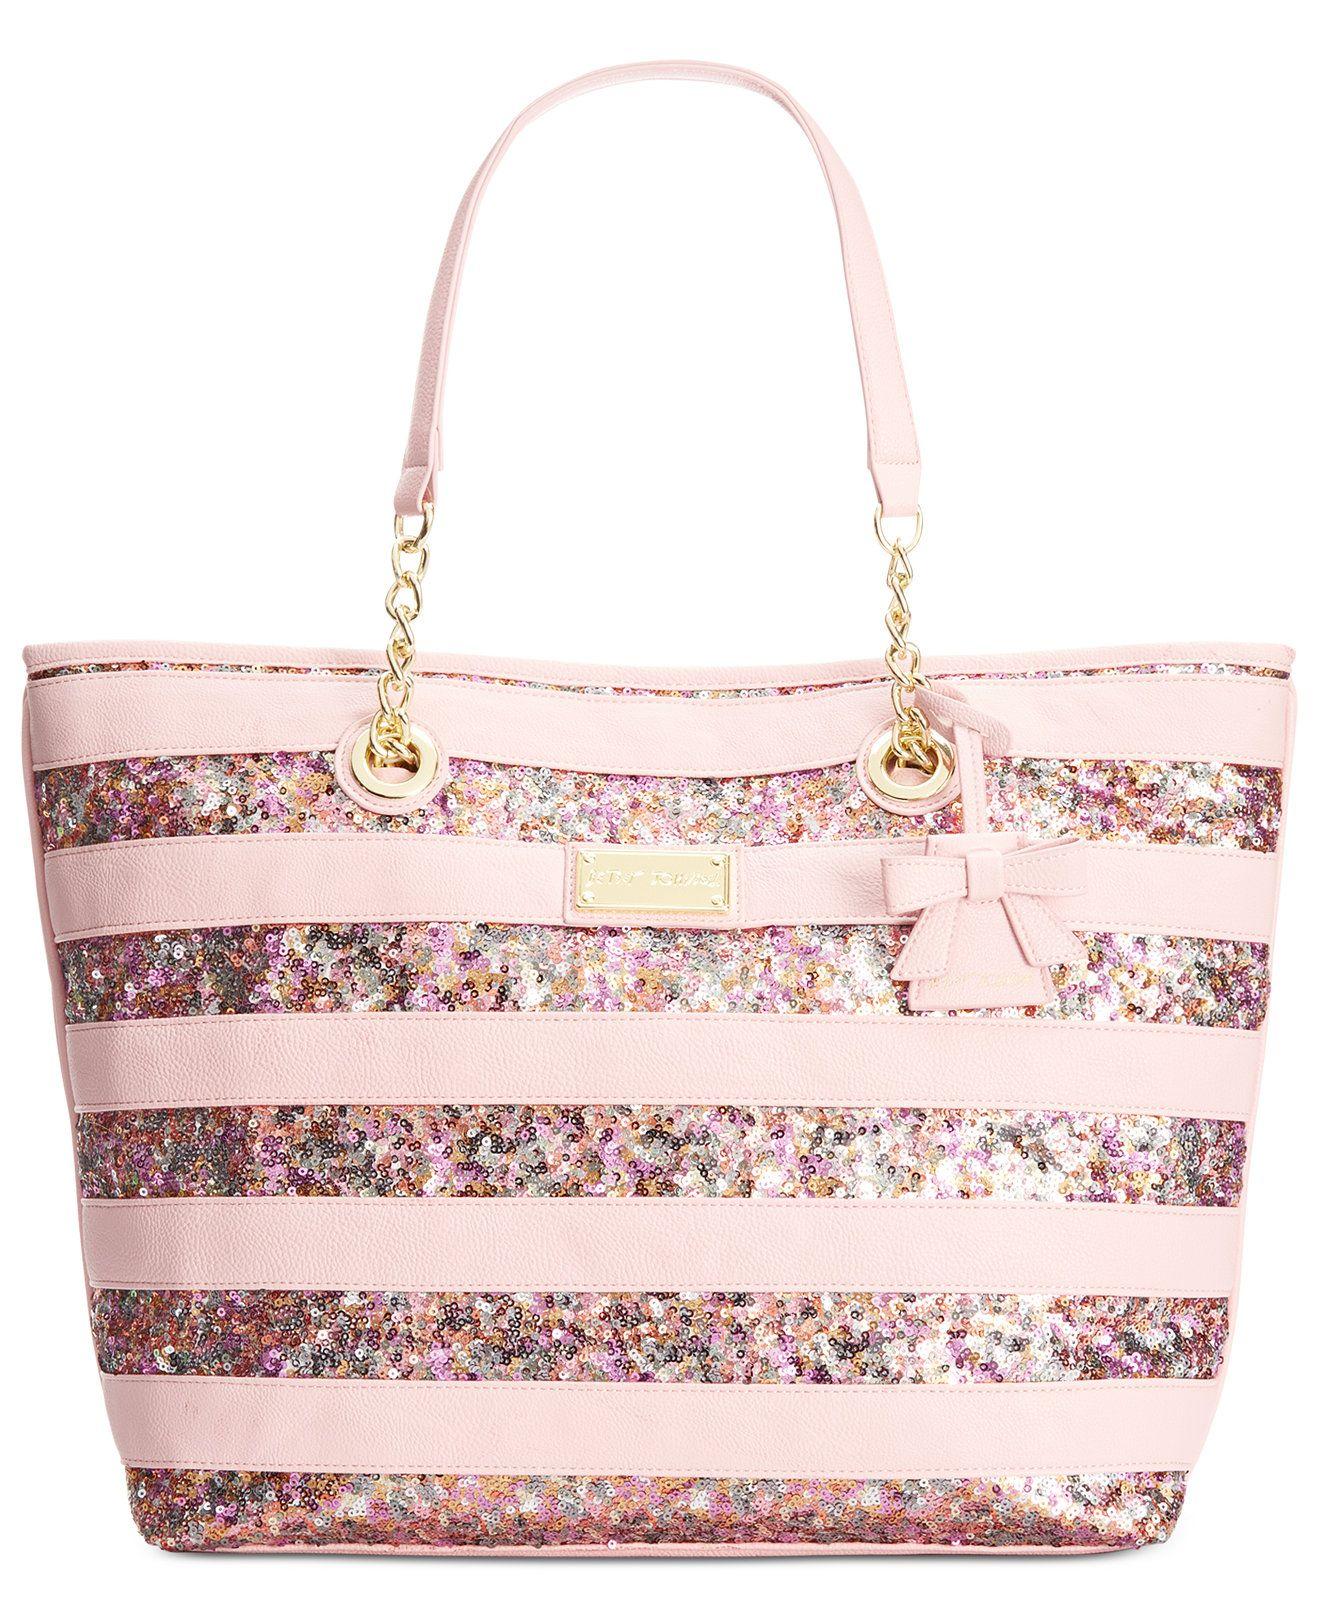 Betsey Johnson Macy S Exclusive Stripe Sequin Tote Handbags Accessories